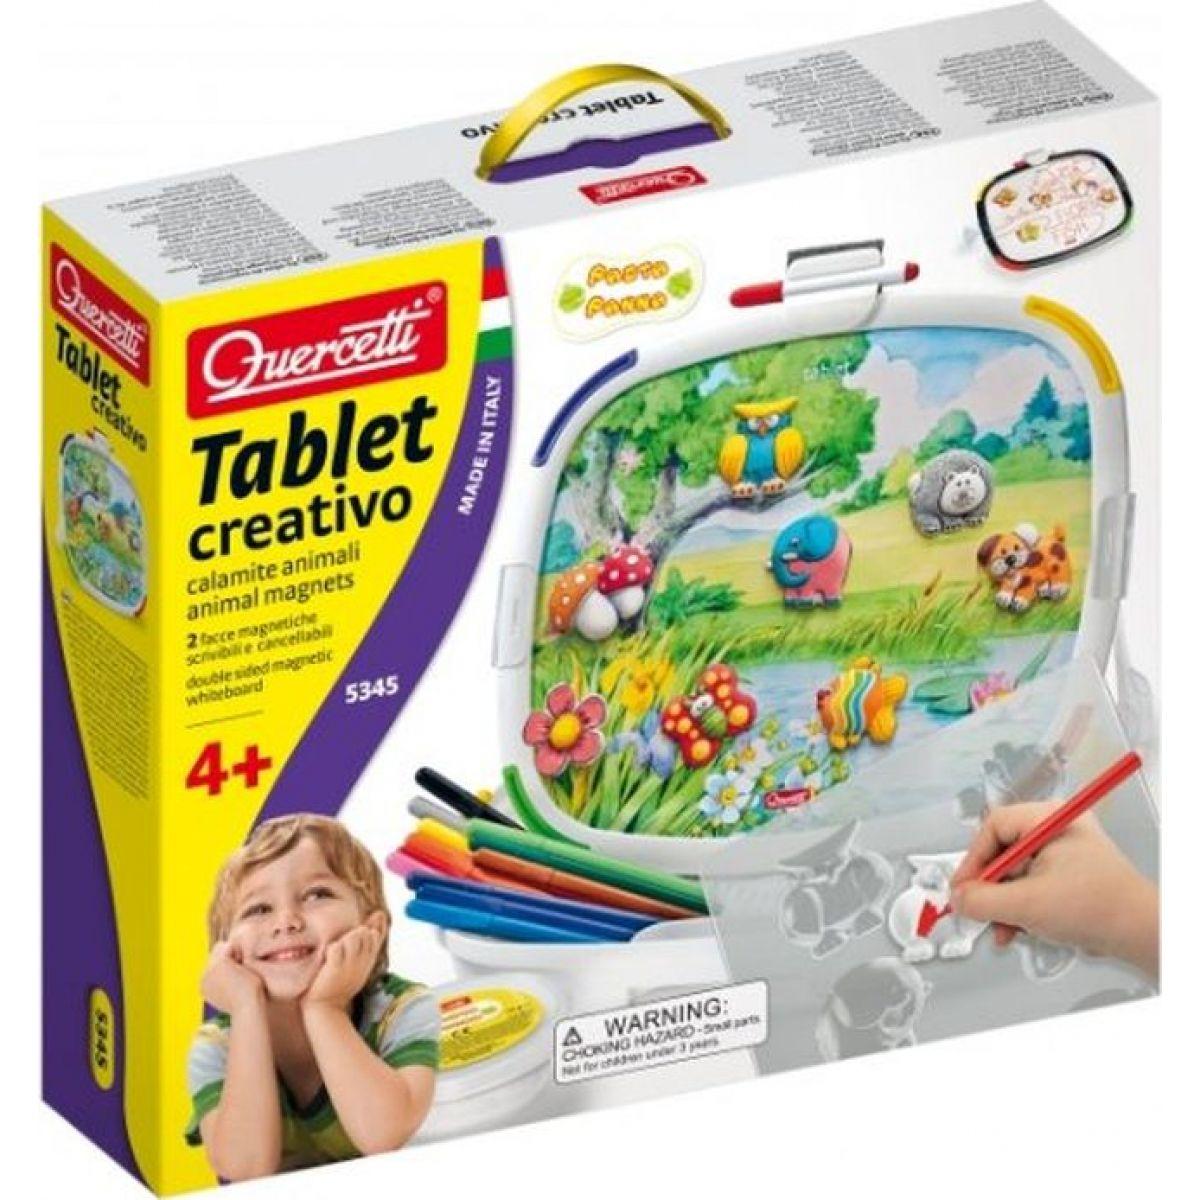 Quercetti Tablet creativo